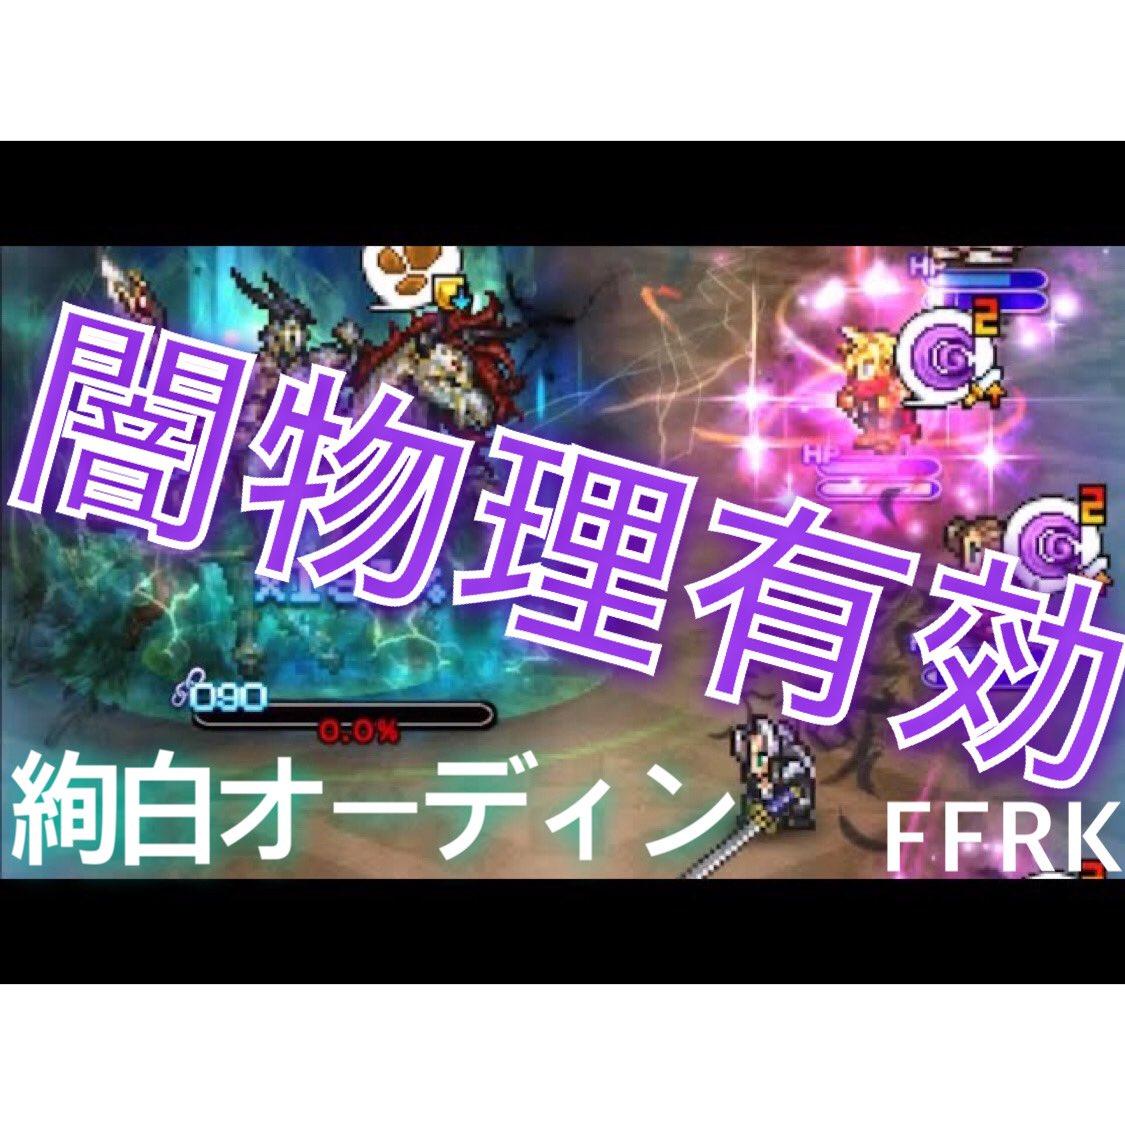 【FFRK】#760 絢白オーディン闇物理有効!闇クラウド使っての騎士王の記憶白おでん撃破攻略!FF好きDJのファイナルファンタジーレコードキー...  @YouTubeよりYouTubeにて絢白オーディン闇物理有効の撃破動画アップしました。#FFRK #FF_RK